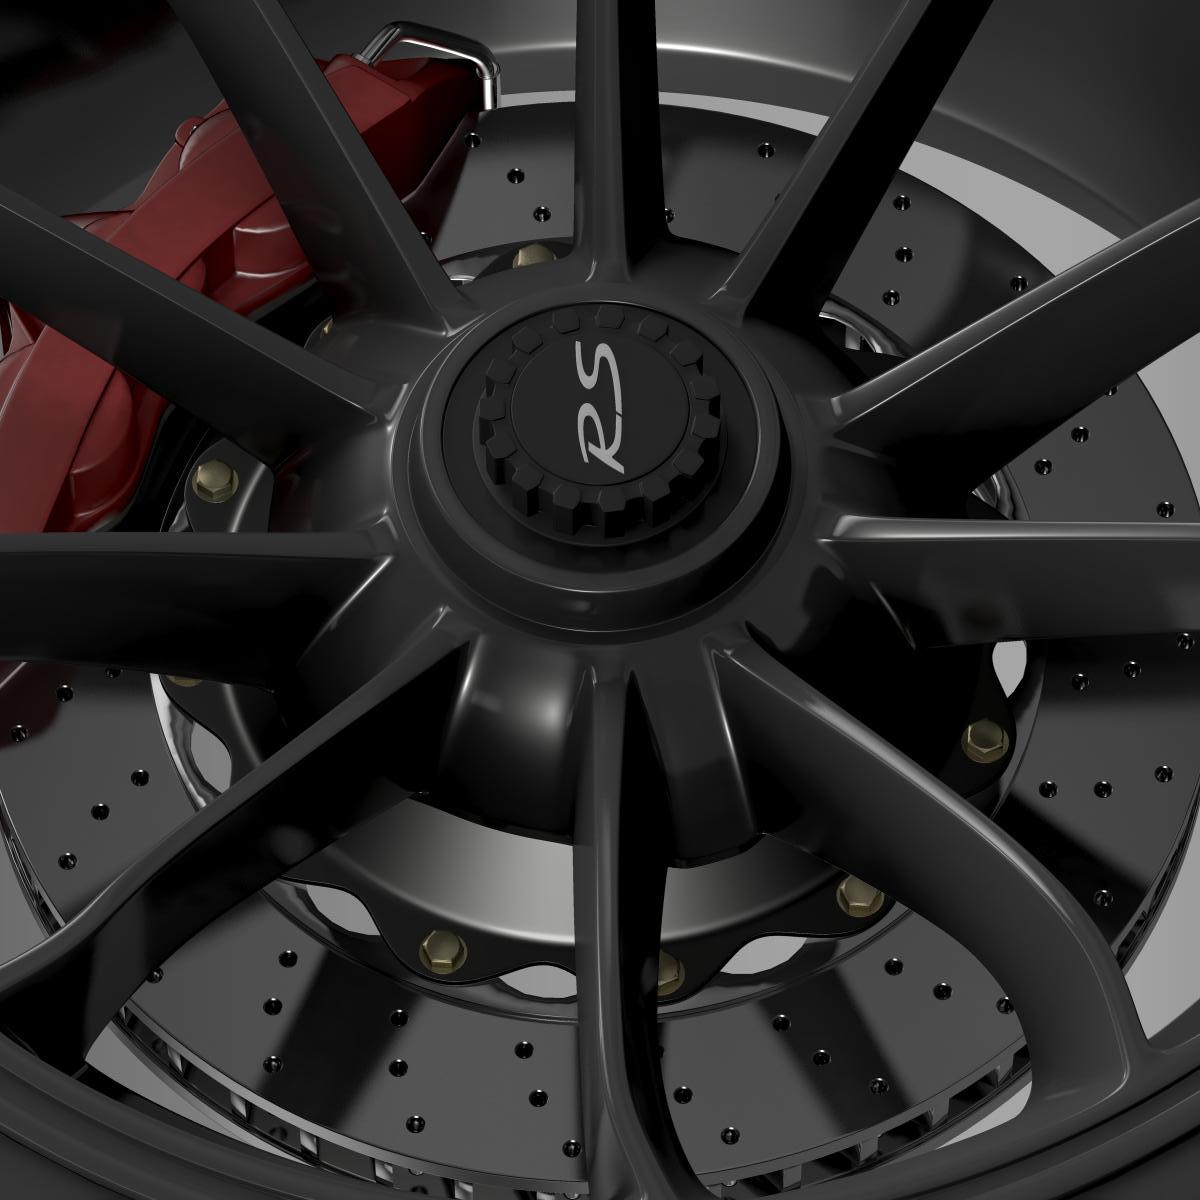 porsche 911 gt3 rs 2015 wheel 3d model 3ds max fbx c4d lwo ma mb hrc xsi obj 210833